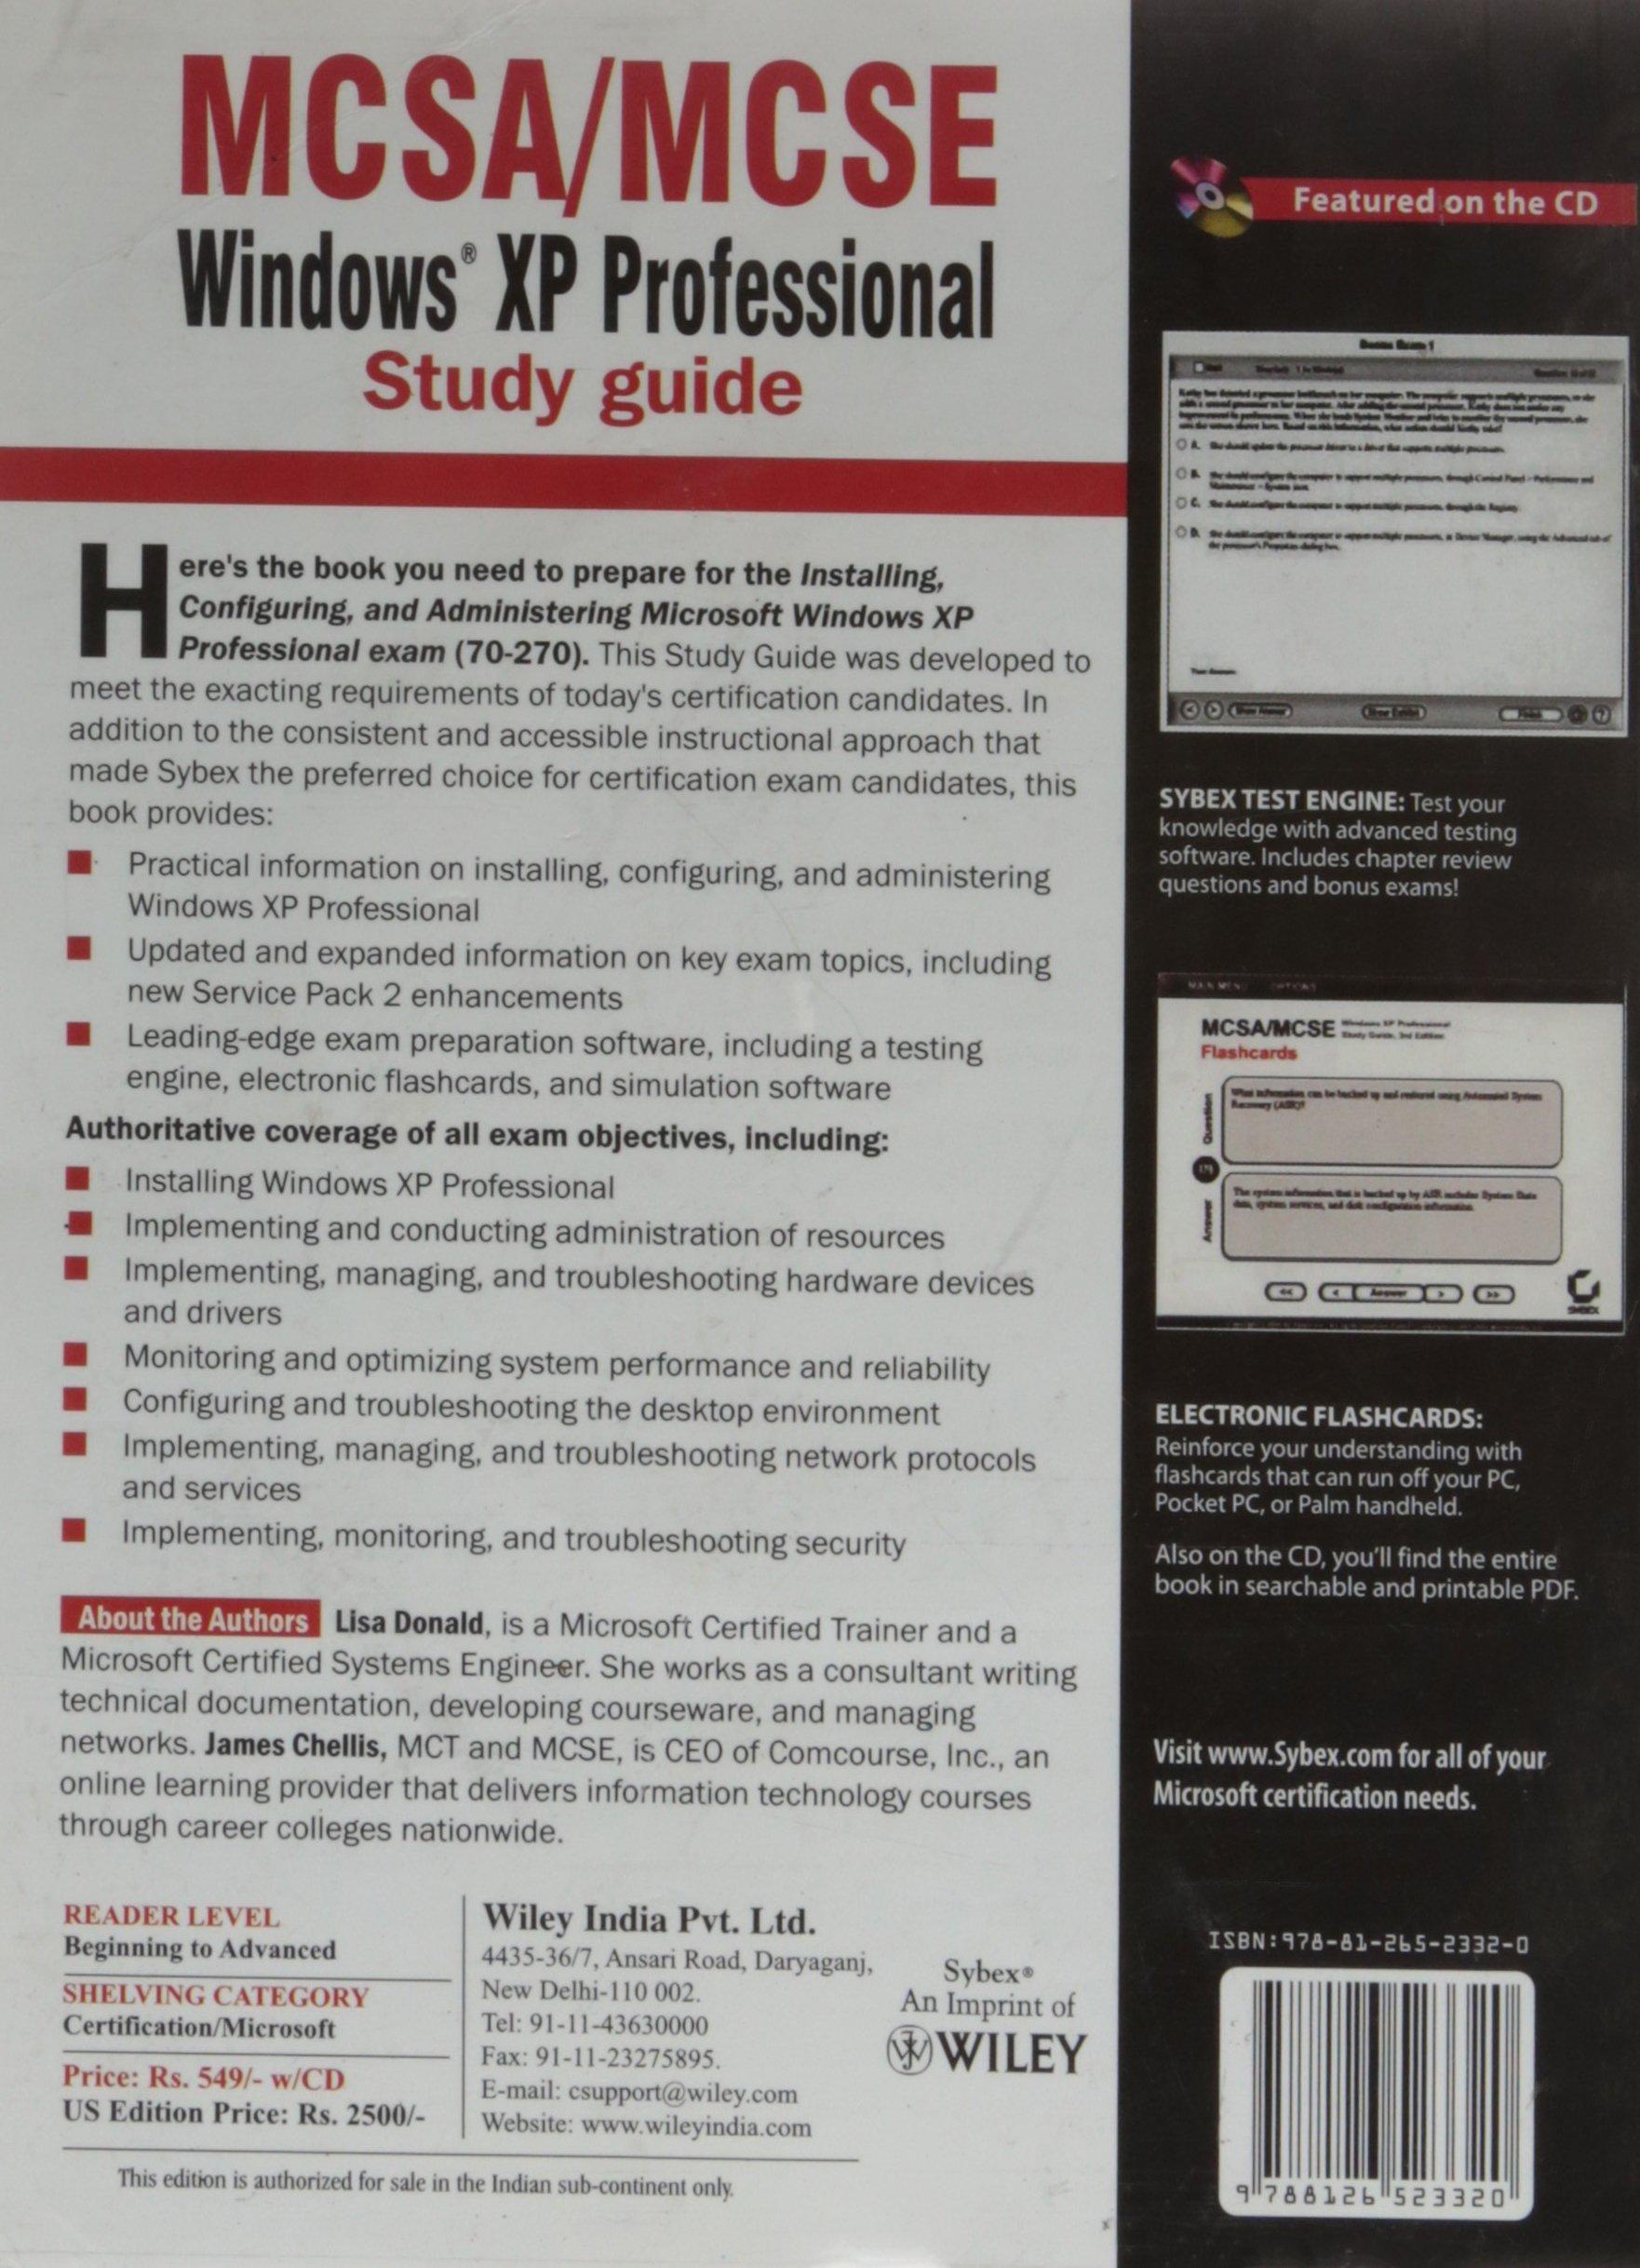 Buy Mcsamcse Windows Xp Professional Study Guide Exam 70 270 Book